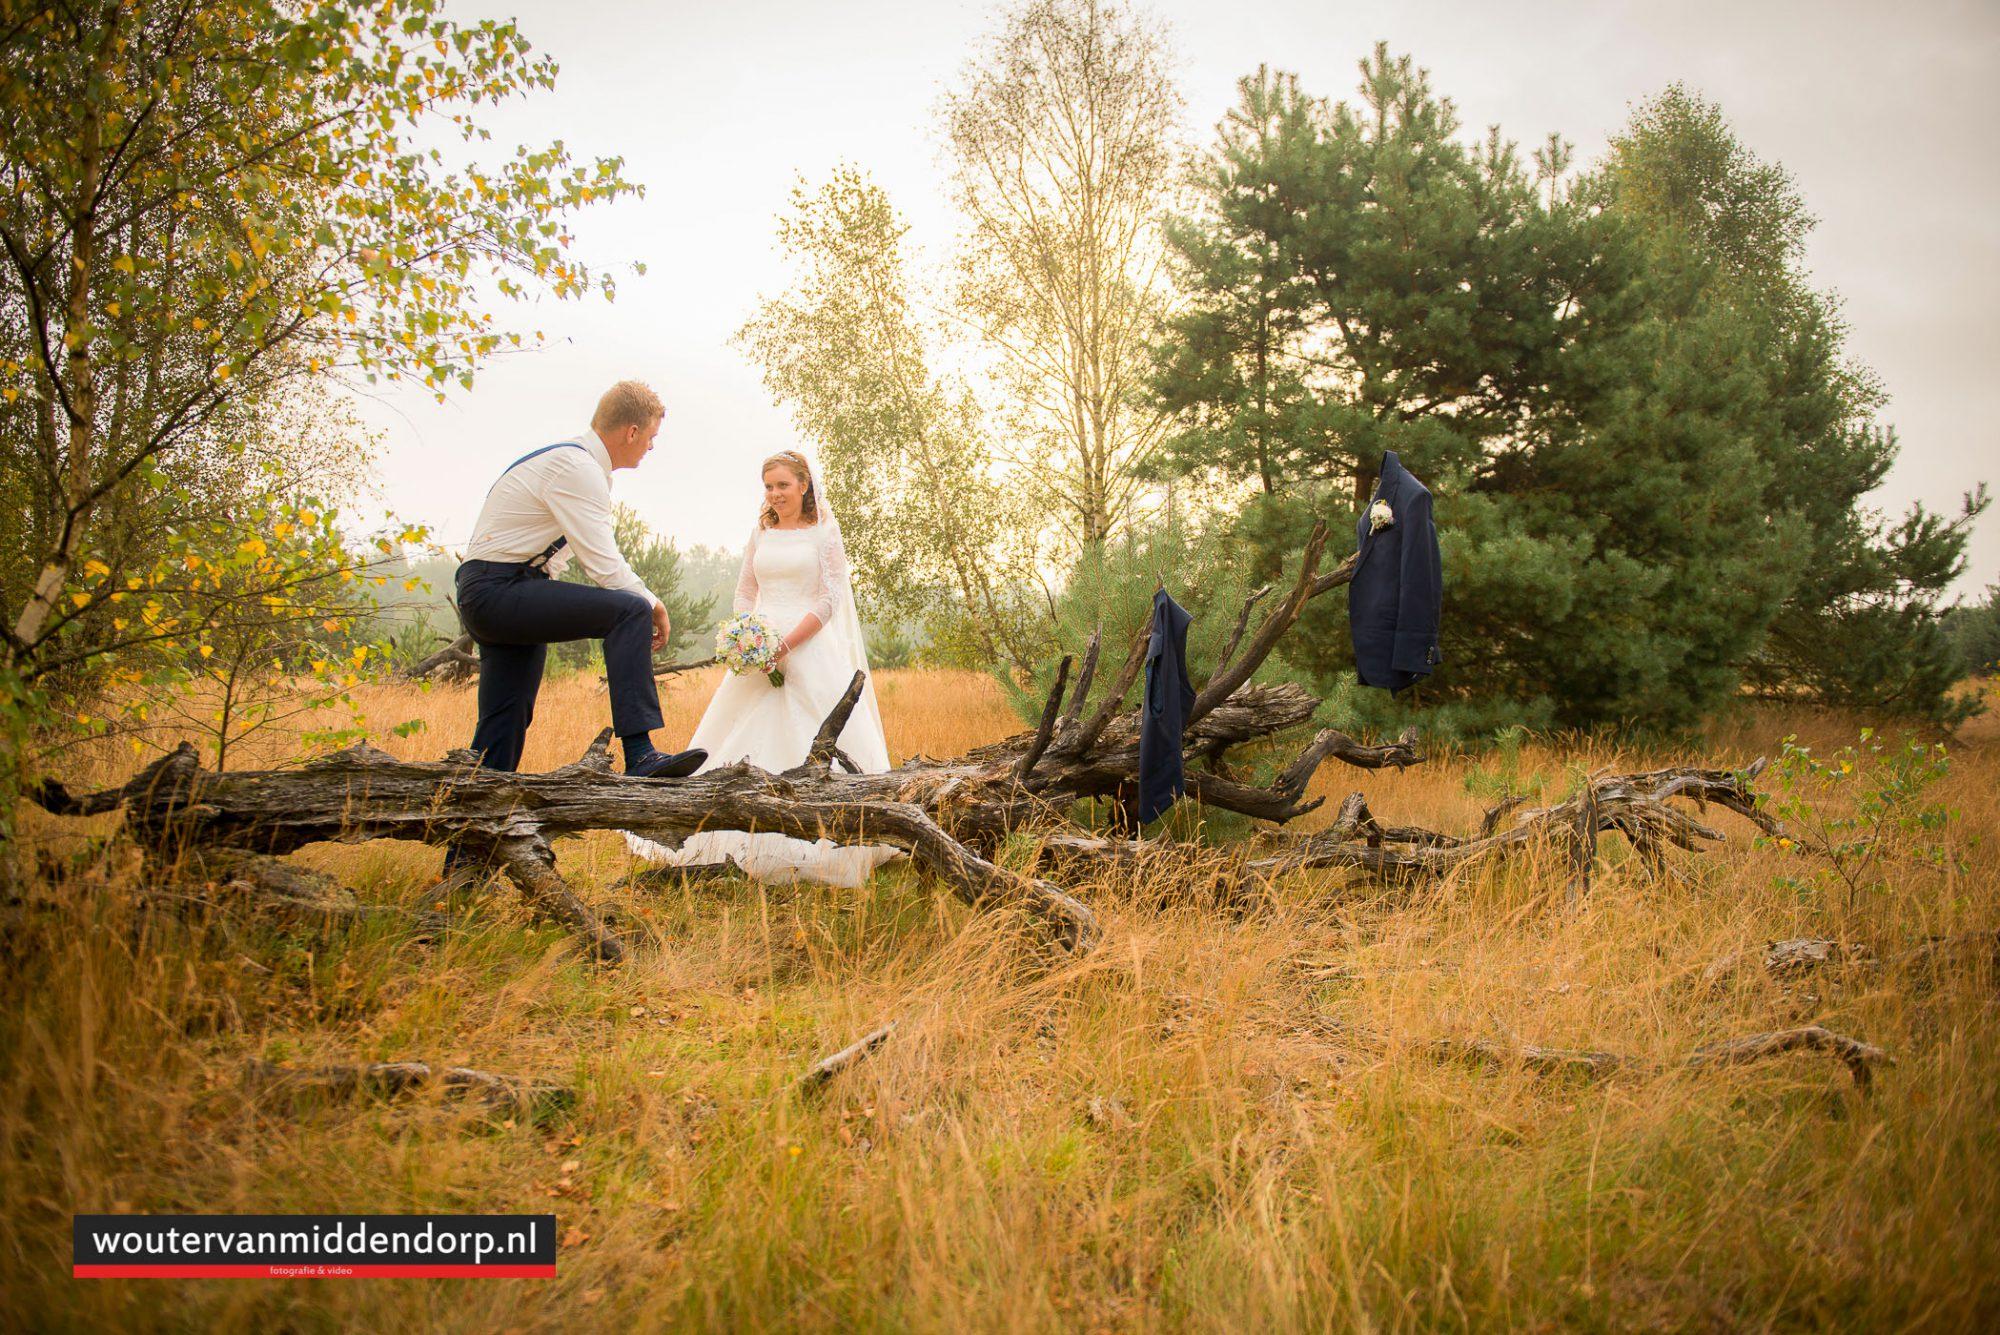 trouwfotograaf-wouter-van-middendorp-omgeving-veluwe-barneveld-uddel-38-van-58